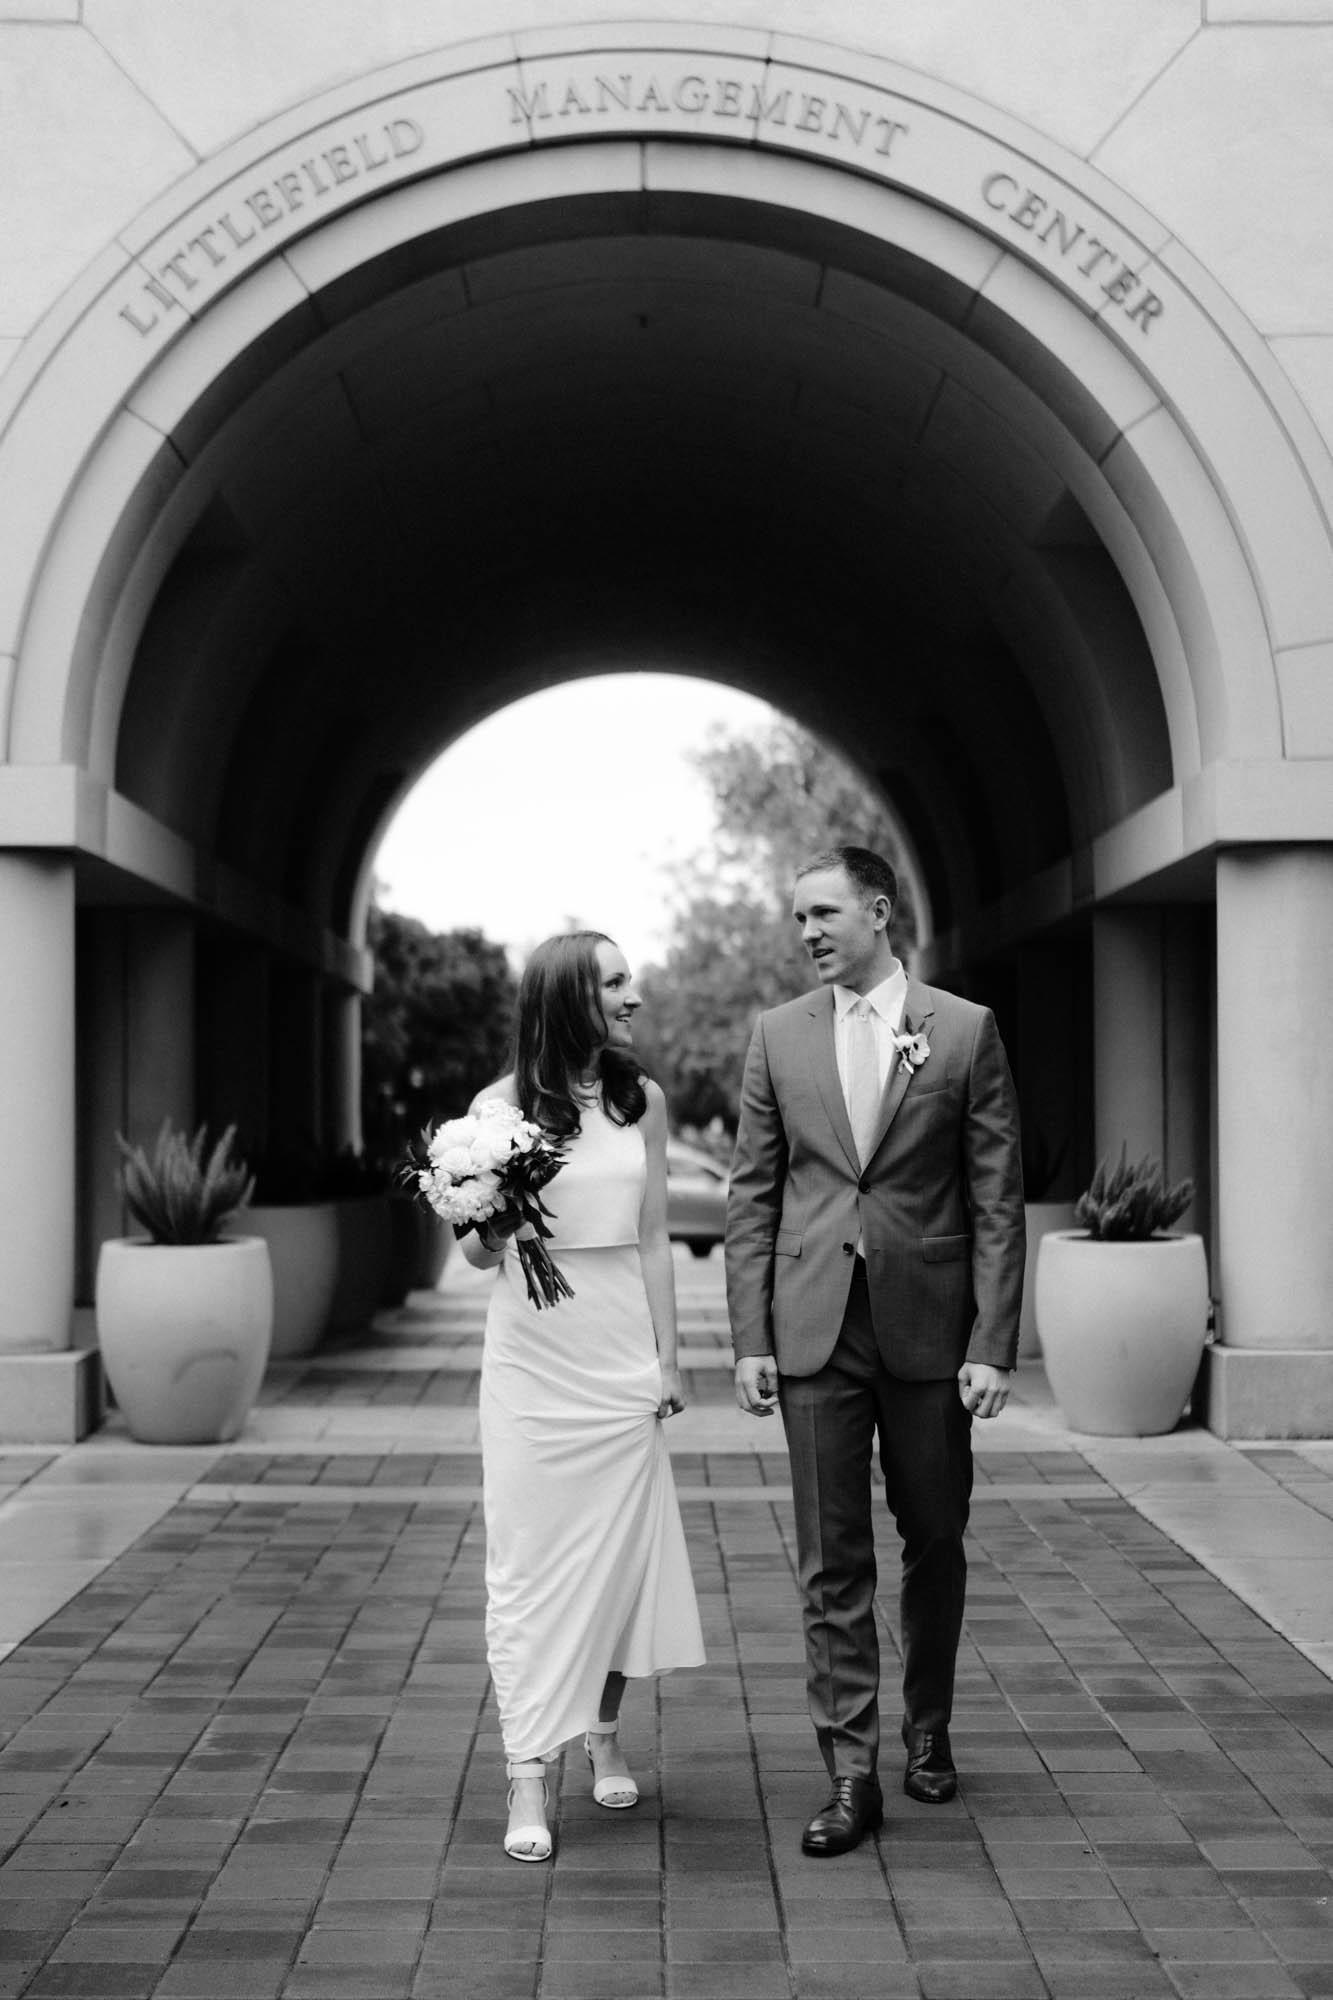 Vina Enoteca Palo Alto Wedding 007.jpg